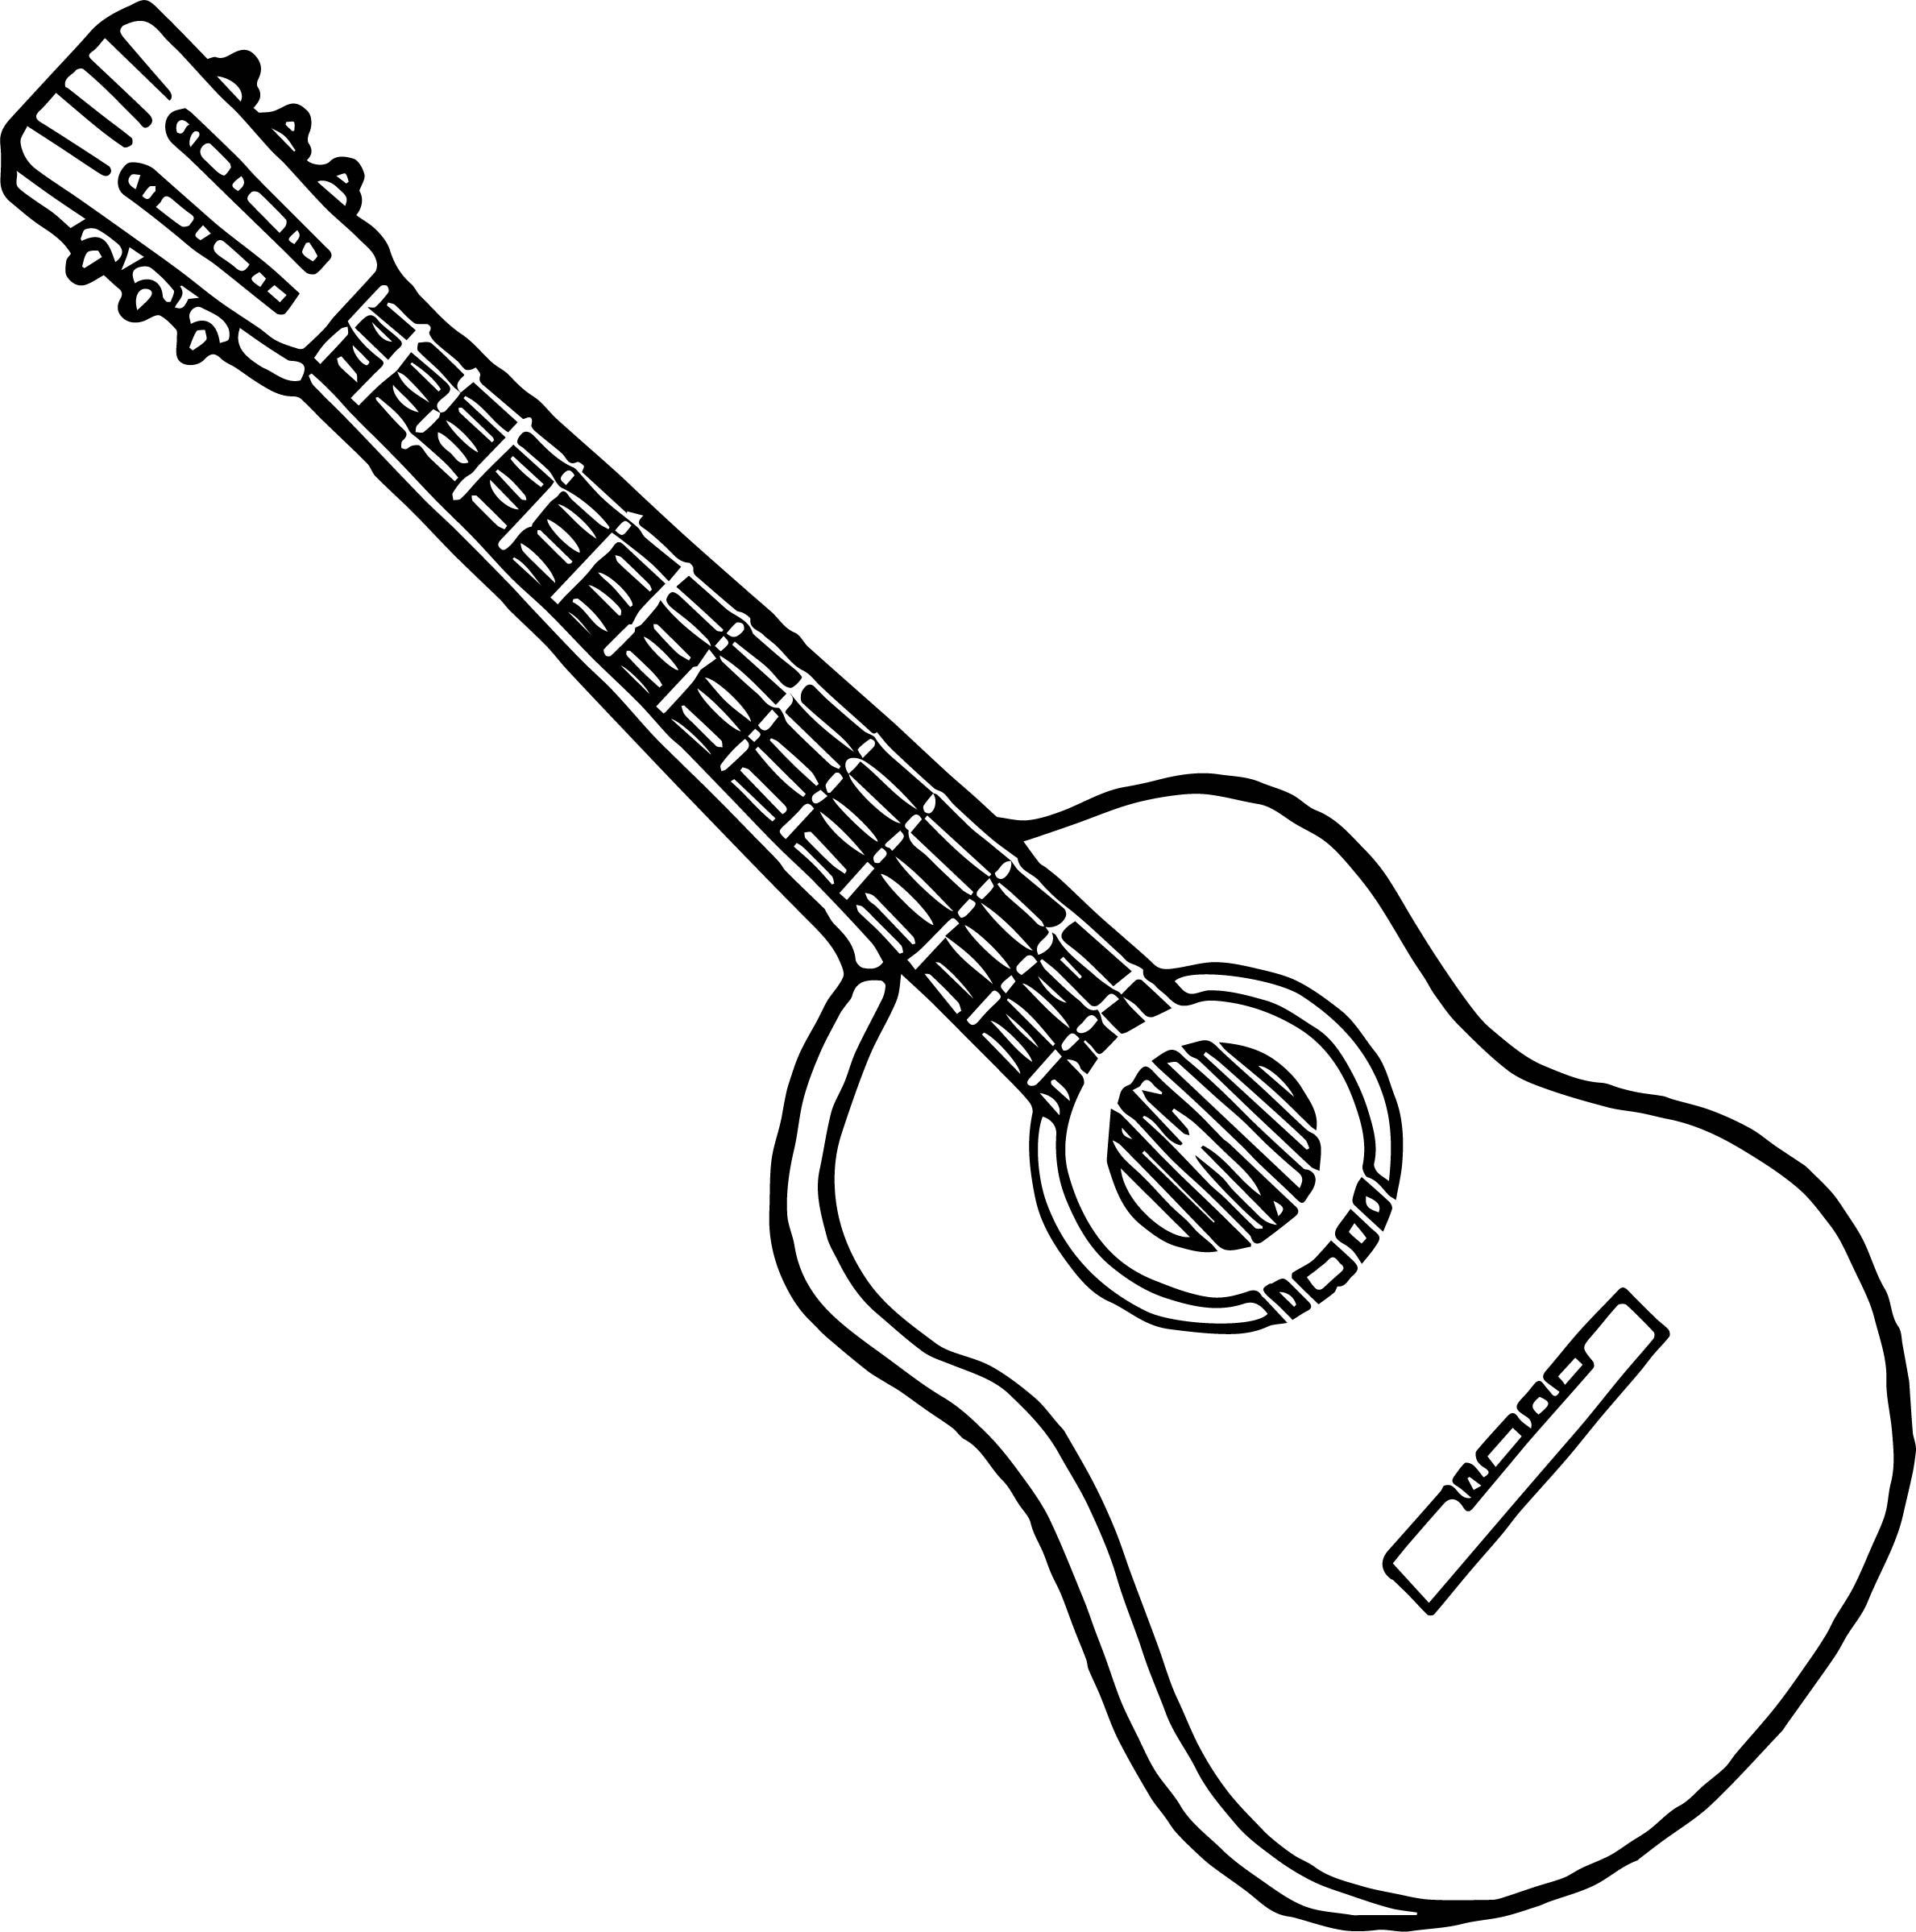 Acoustic Guitar Line Drawing At Getdrawings